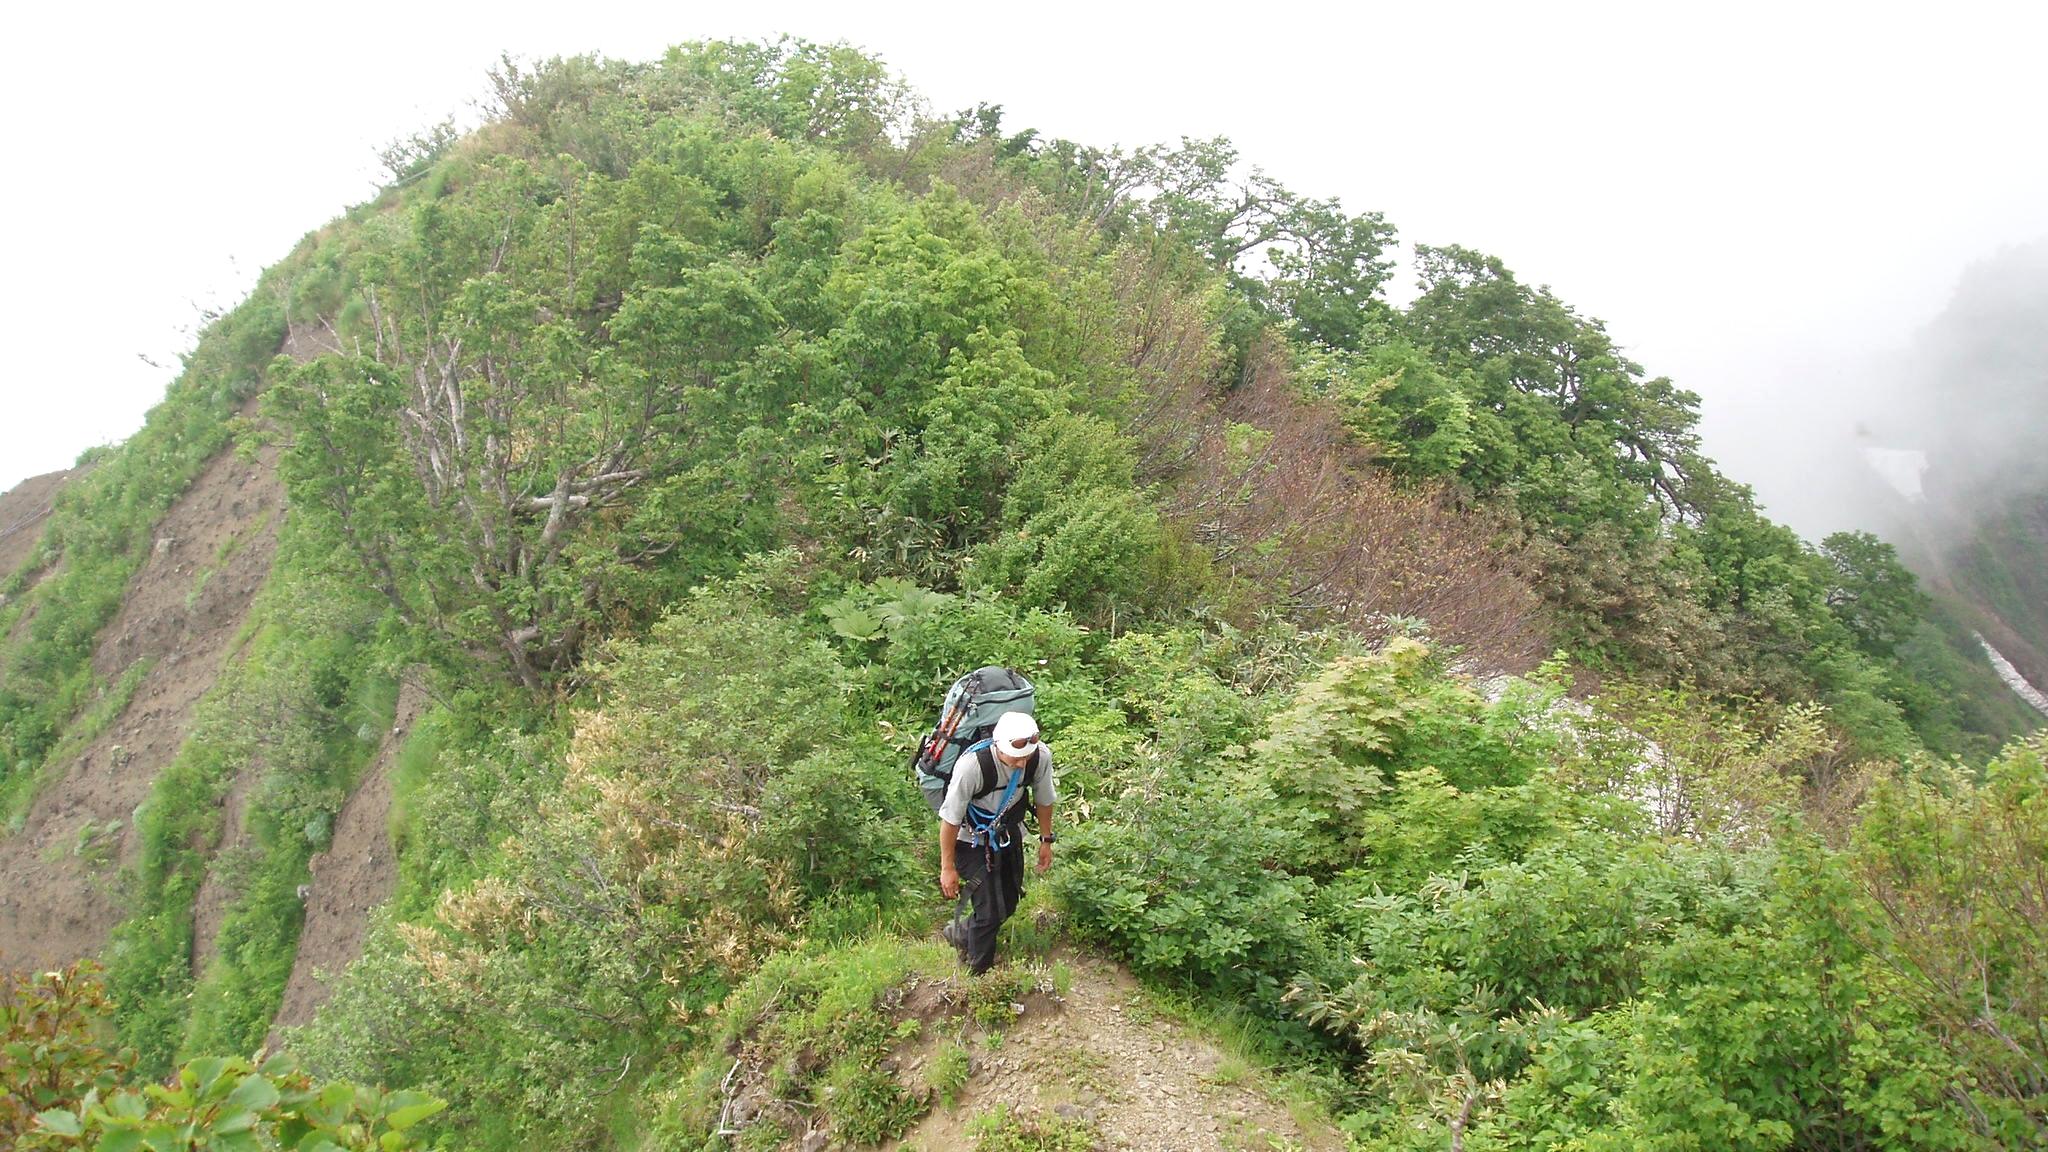 OBS-JALT2006-55日目:登山遠征最終日は、日没寸前に到着!